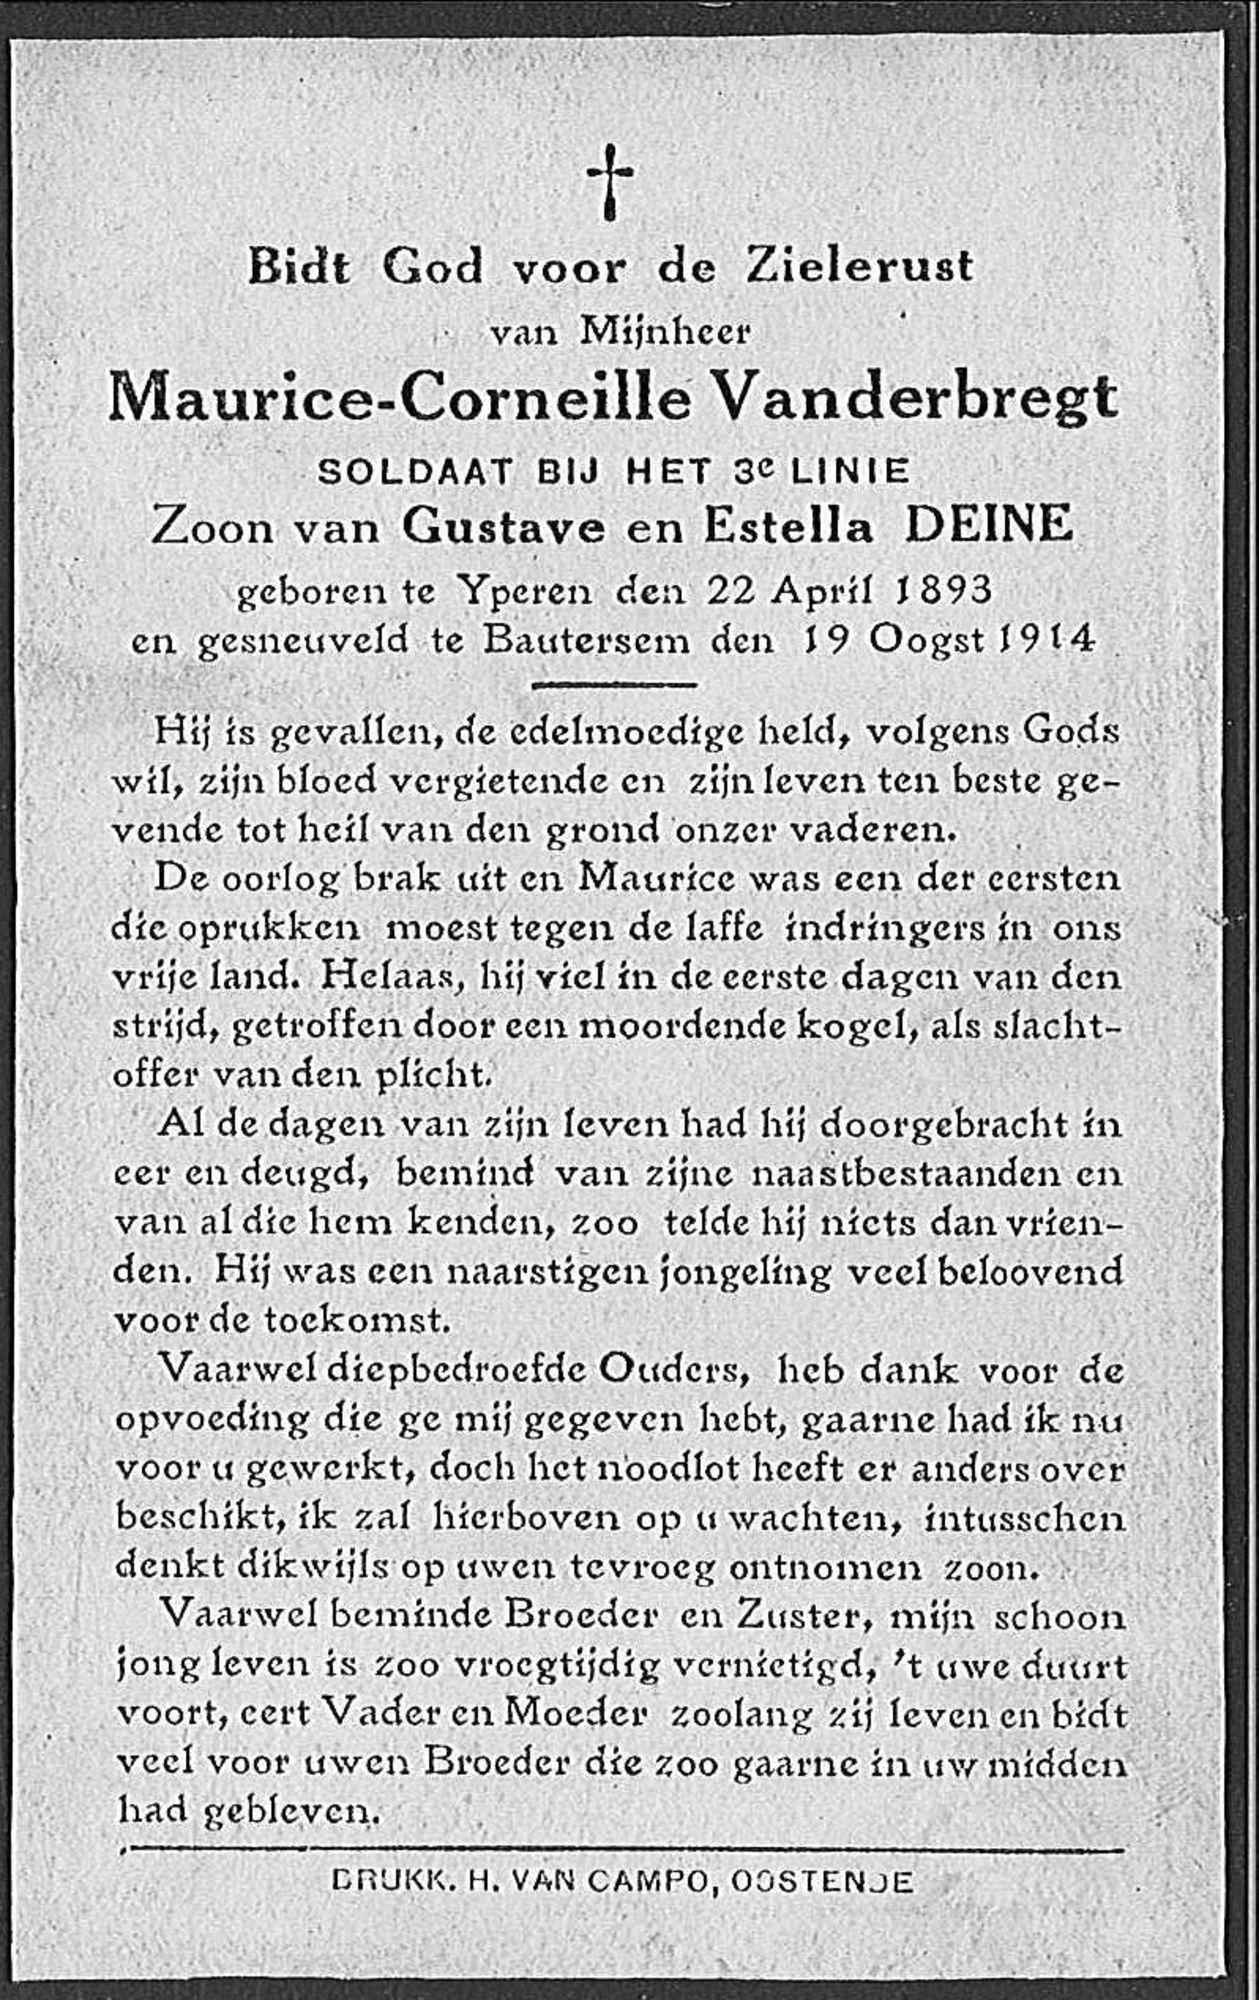 Maurice-Corneille Vanderbregt